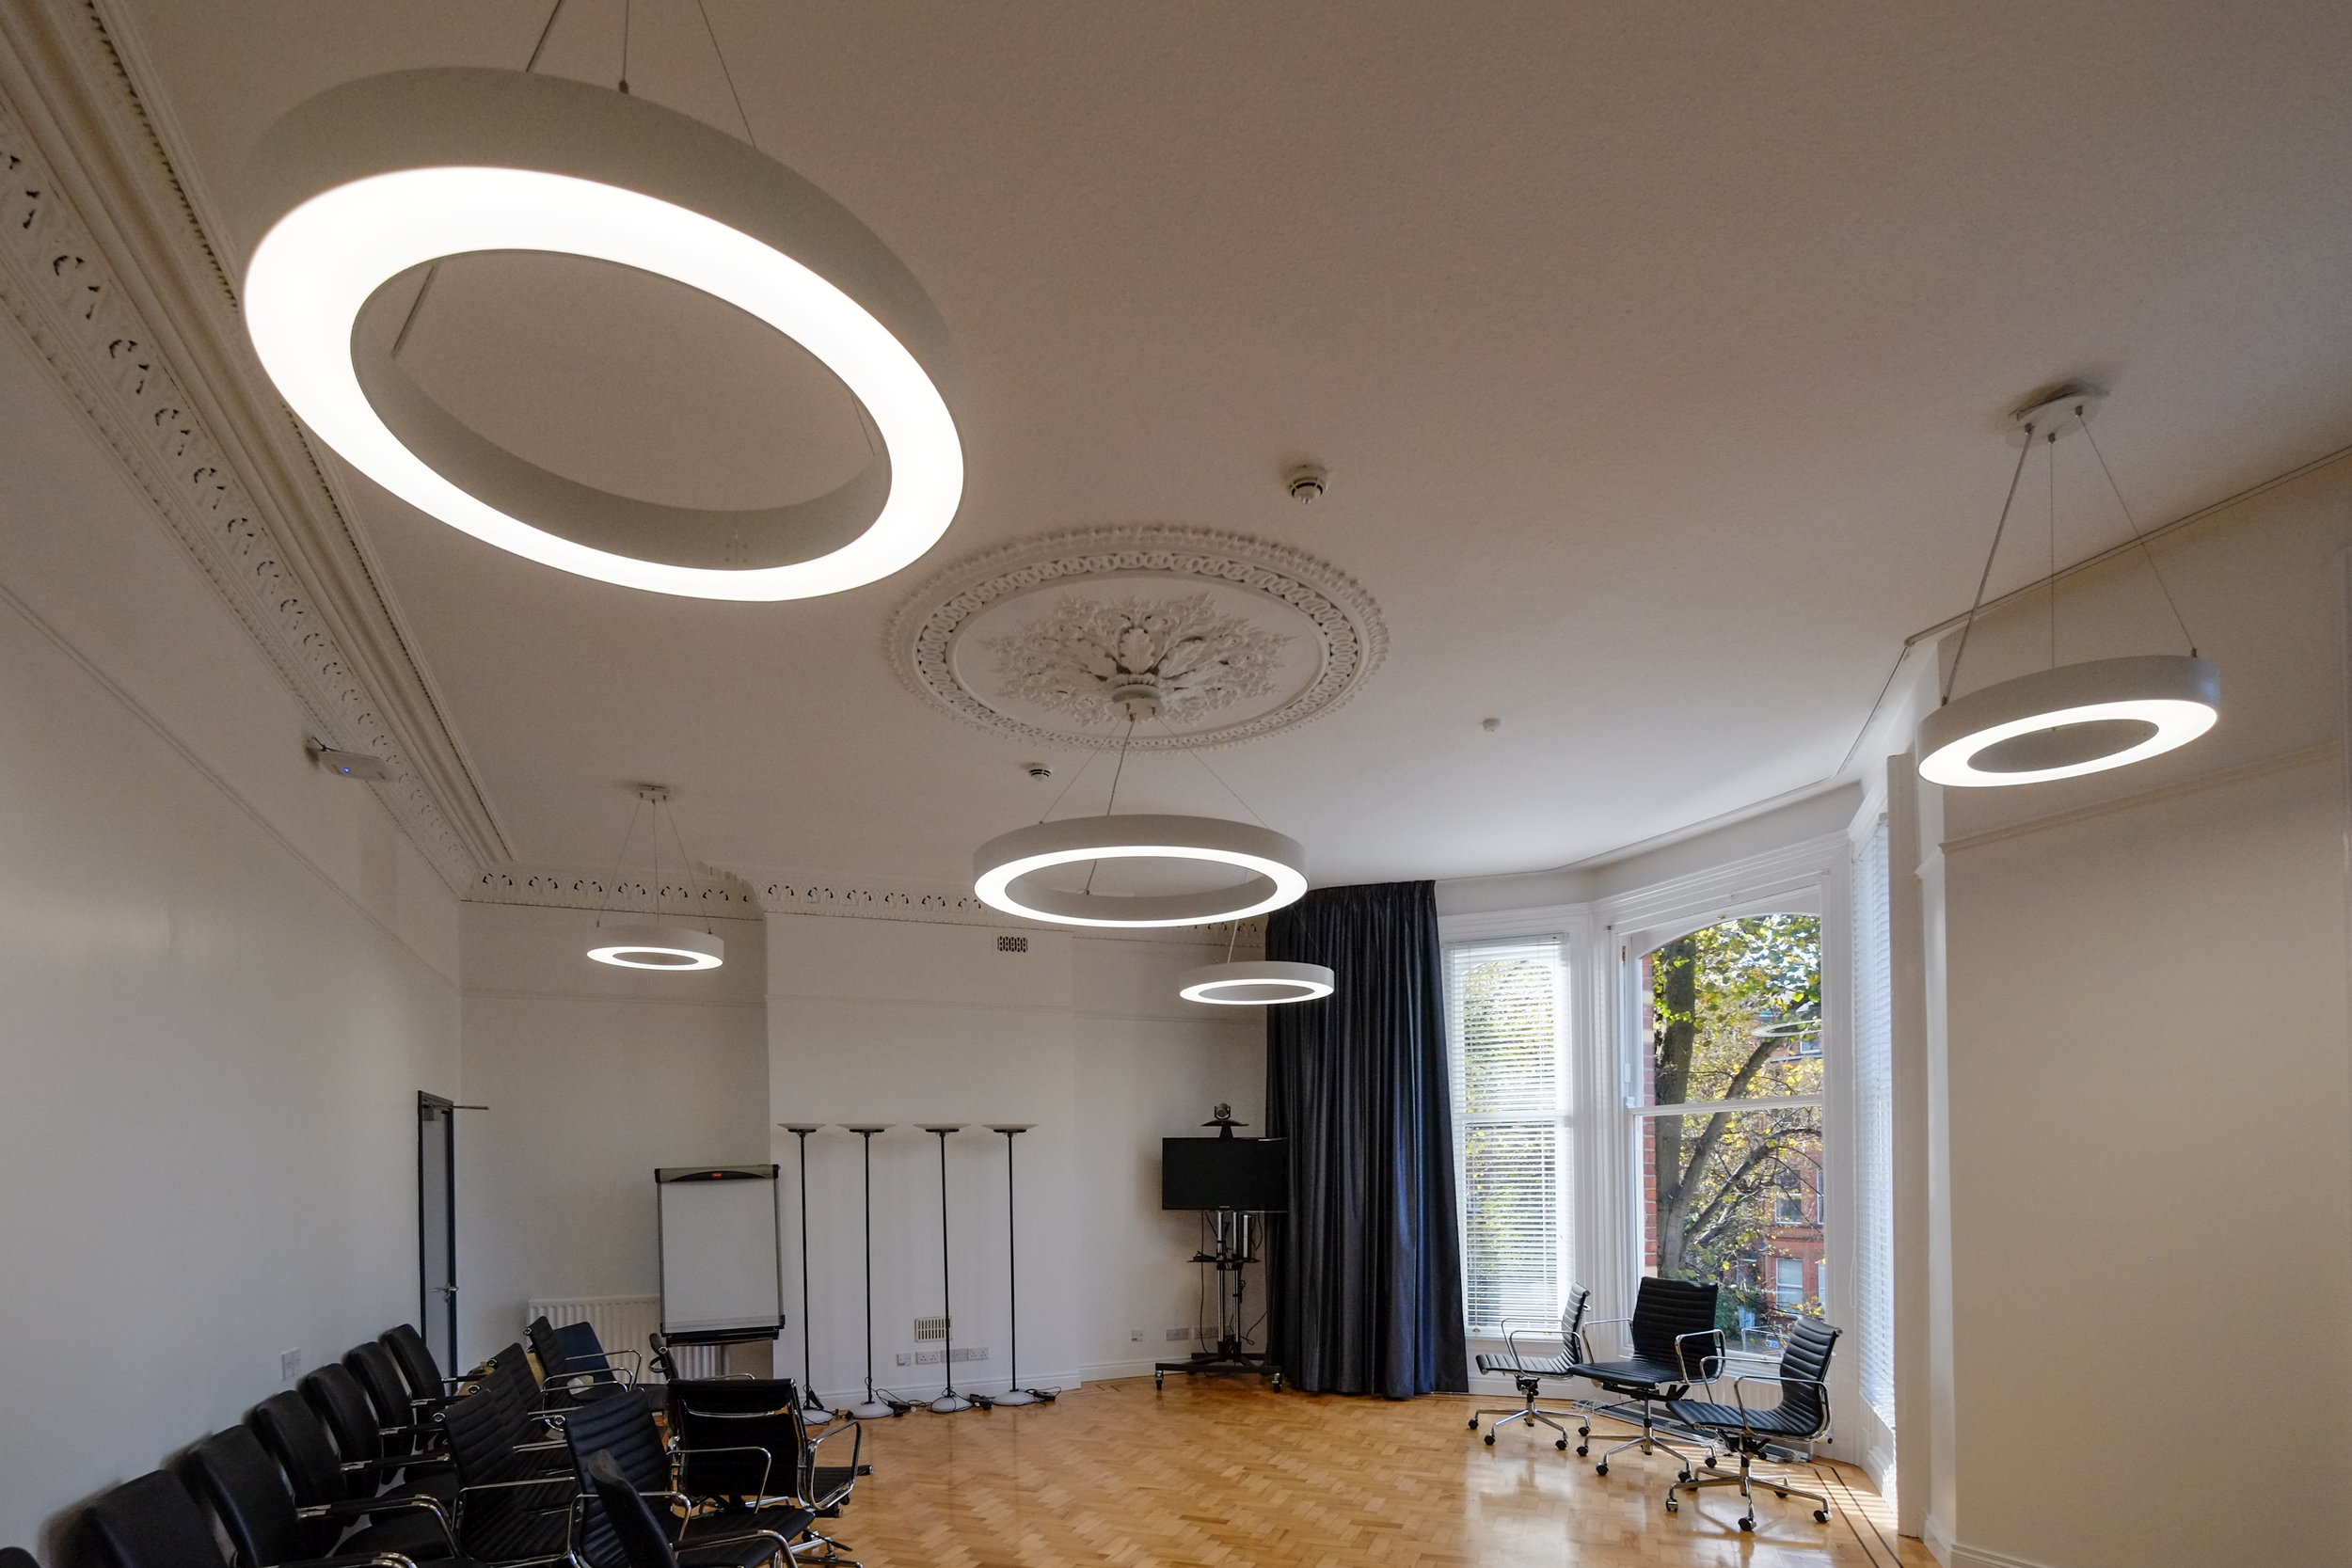 Bernard Crossland Building:  Meeting rooms